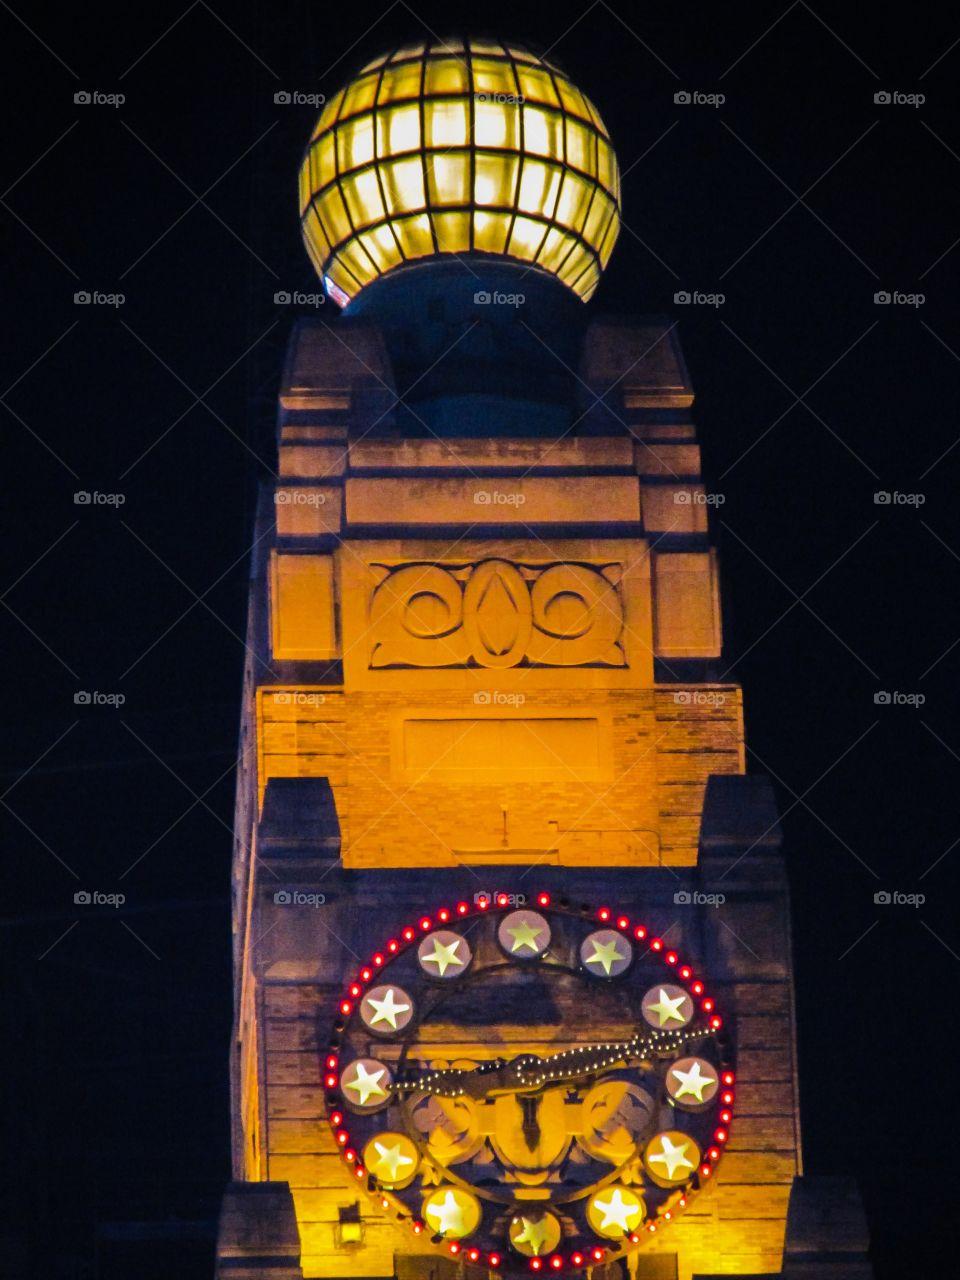 Close-up of clock tower